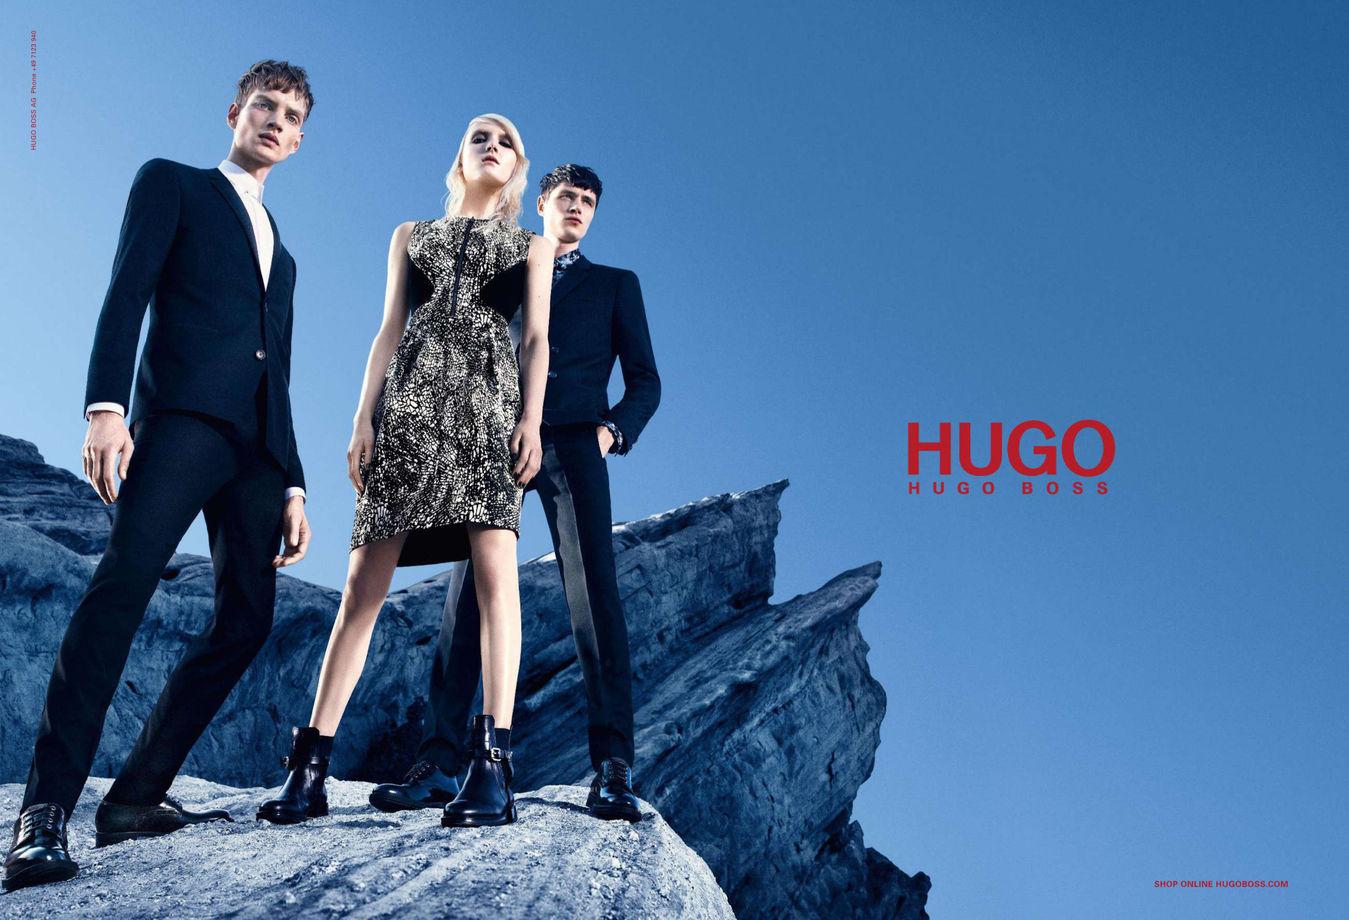 image: Hugo Boss